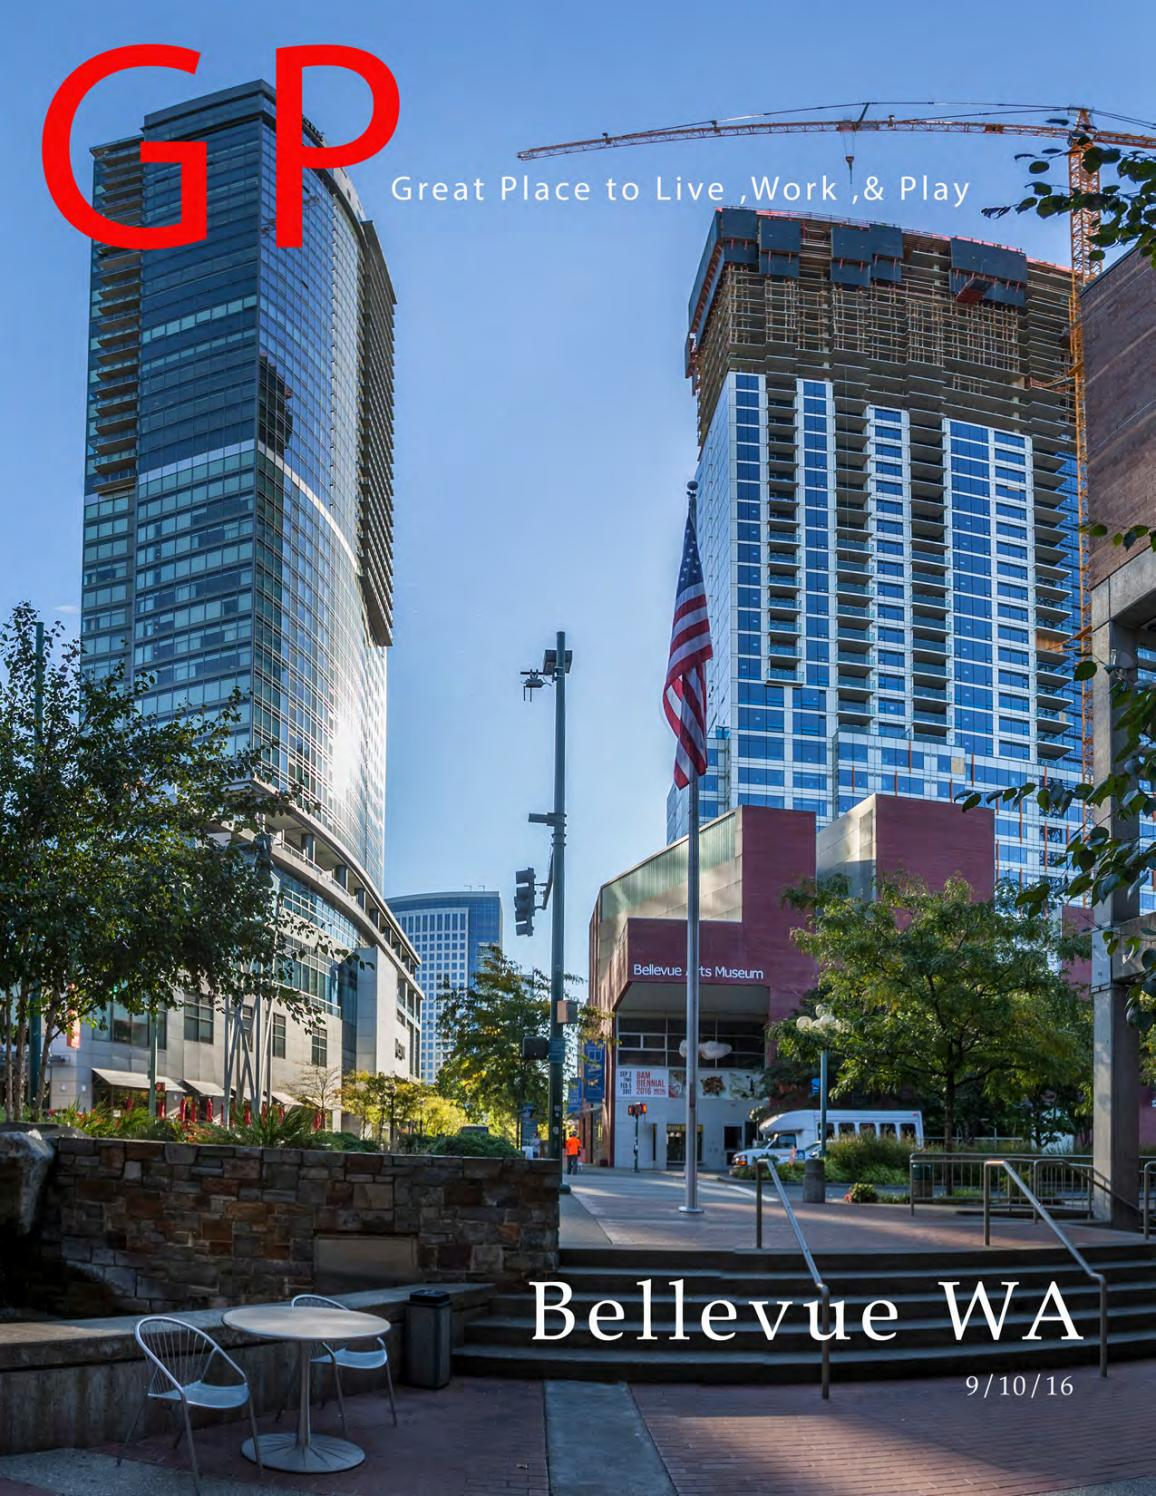 GP Bellevue 9/10/16